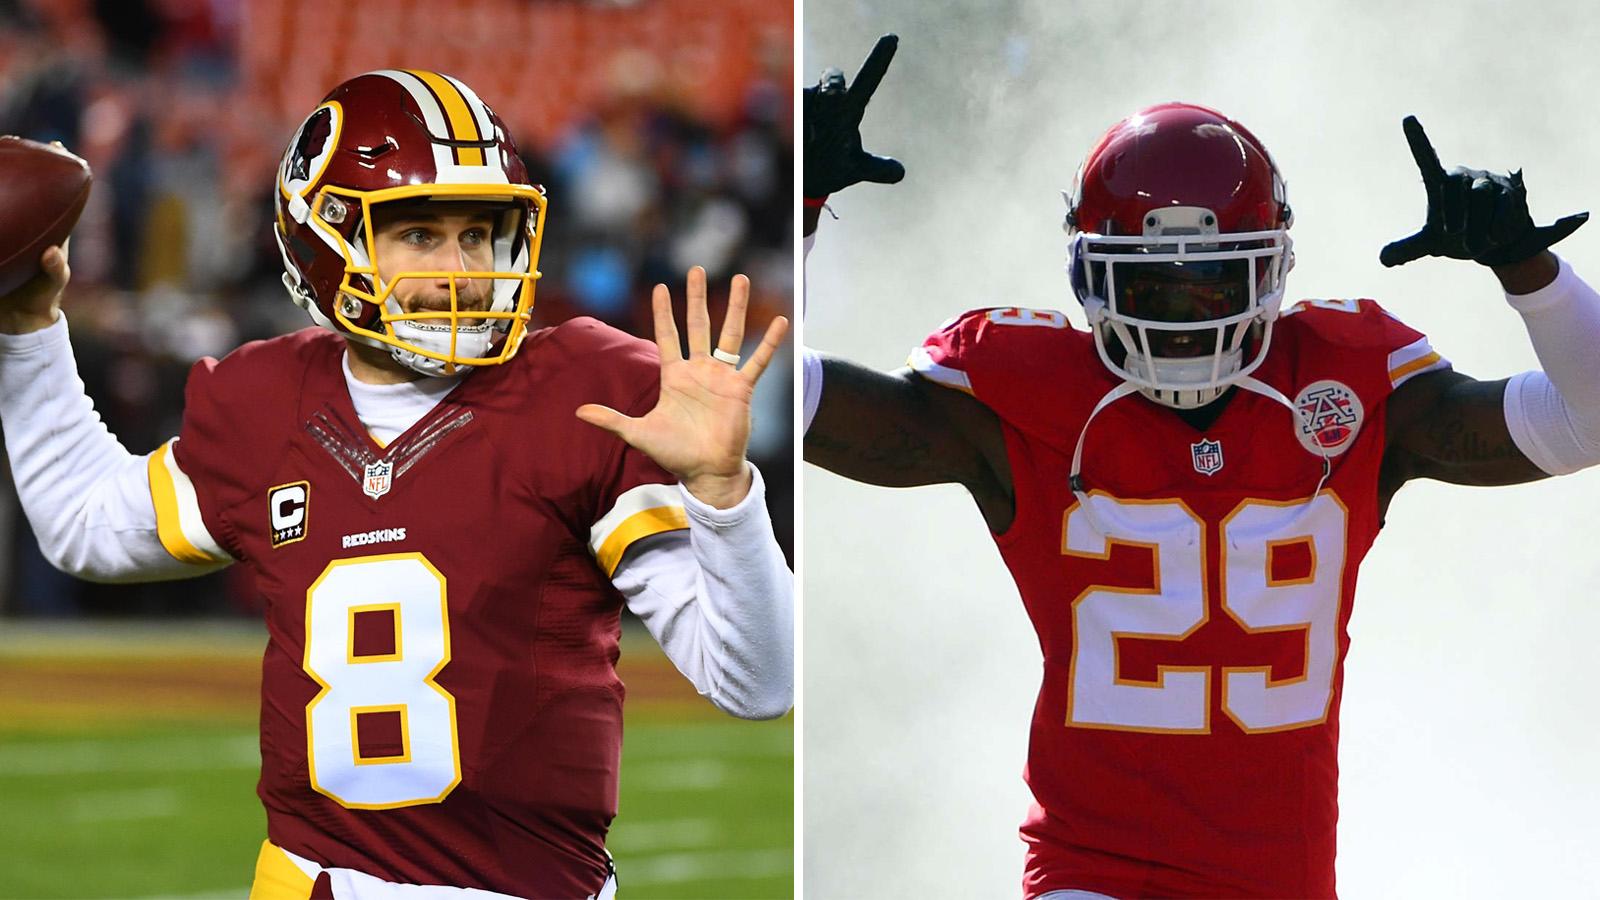 021917-NFL-Redskins-Chiefs-Kirk-Cousins-Eric-Berry